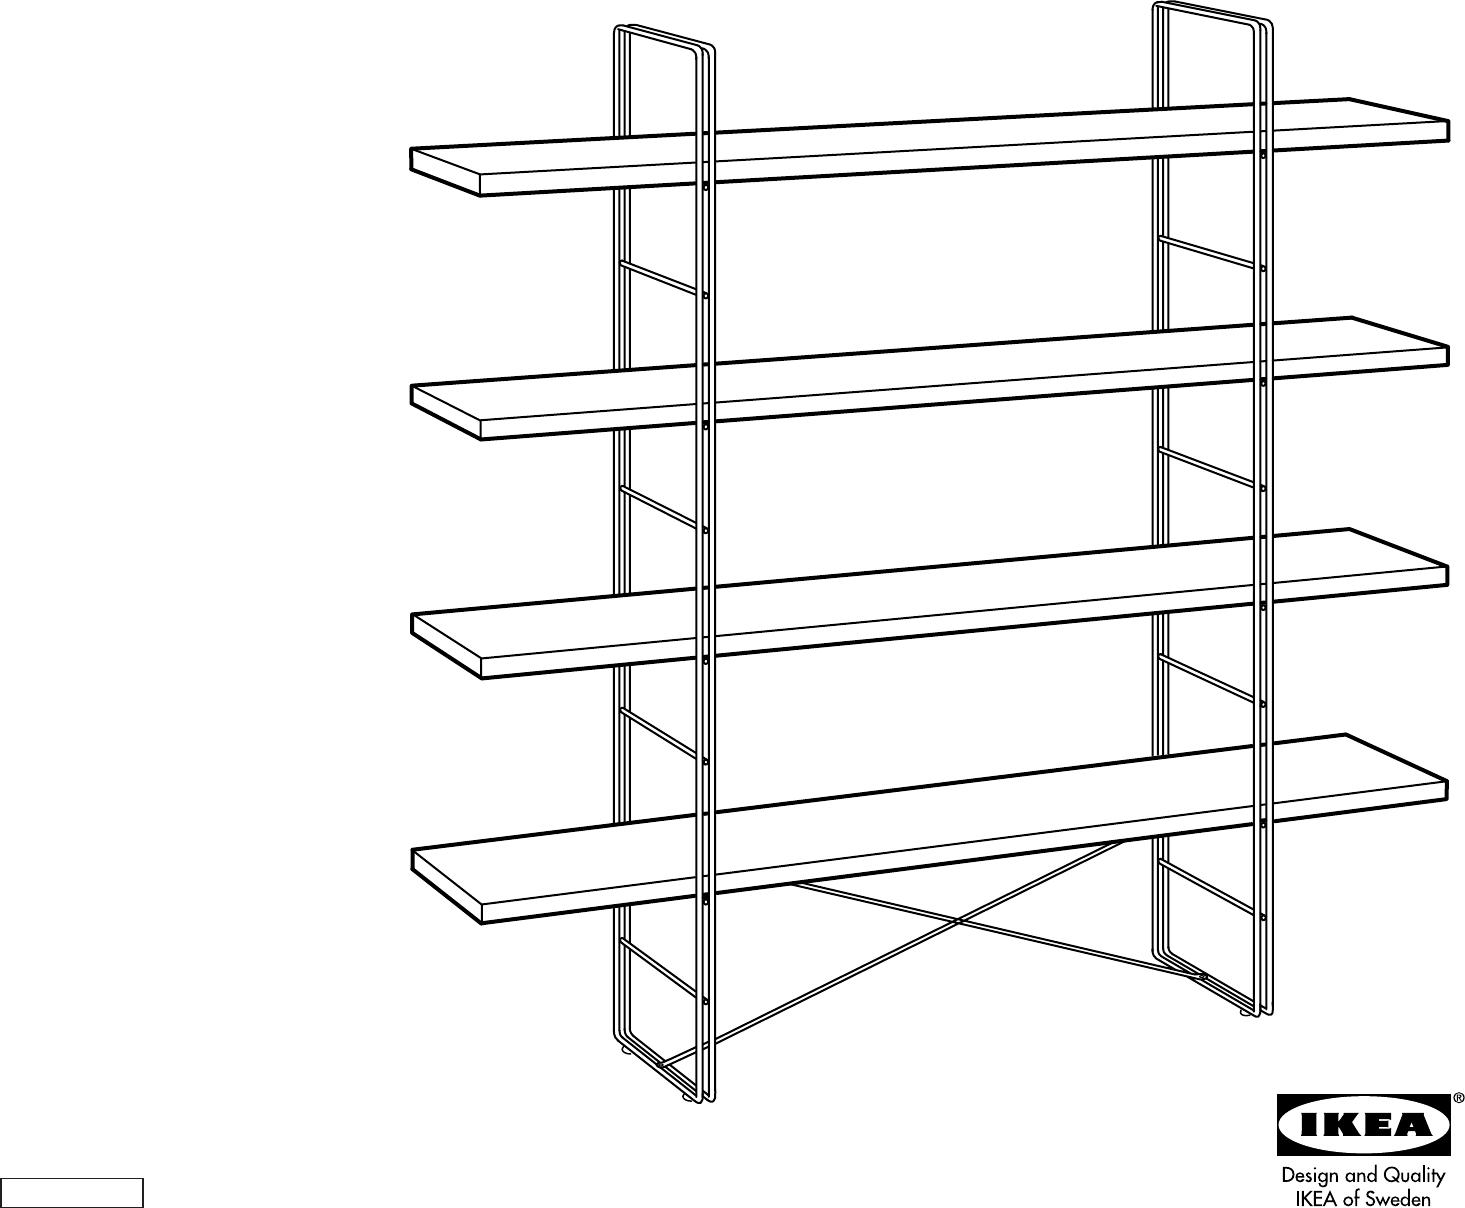 Grundtal Towel Stand From Ikea ~ Handleiding Ikea Enetri open kast (pagina 1 van 4) (Dansk, Deutsch